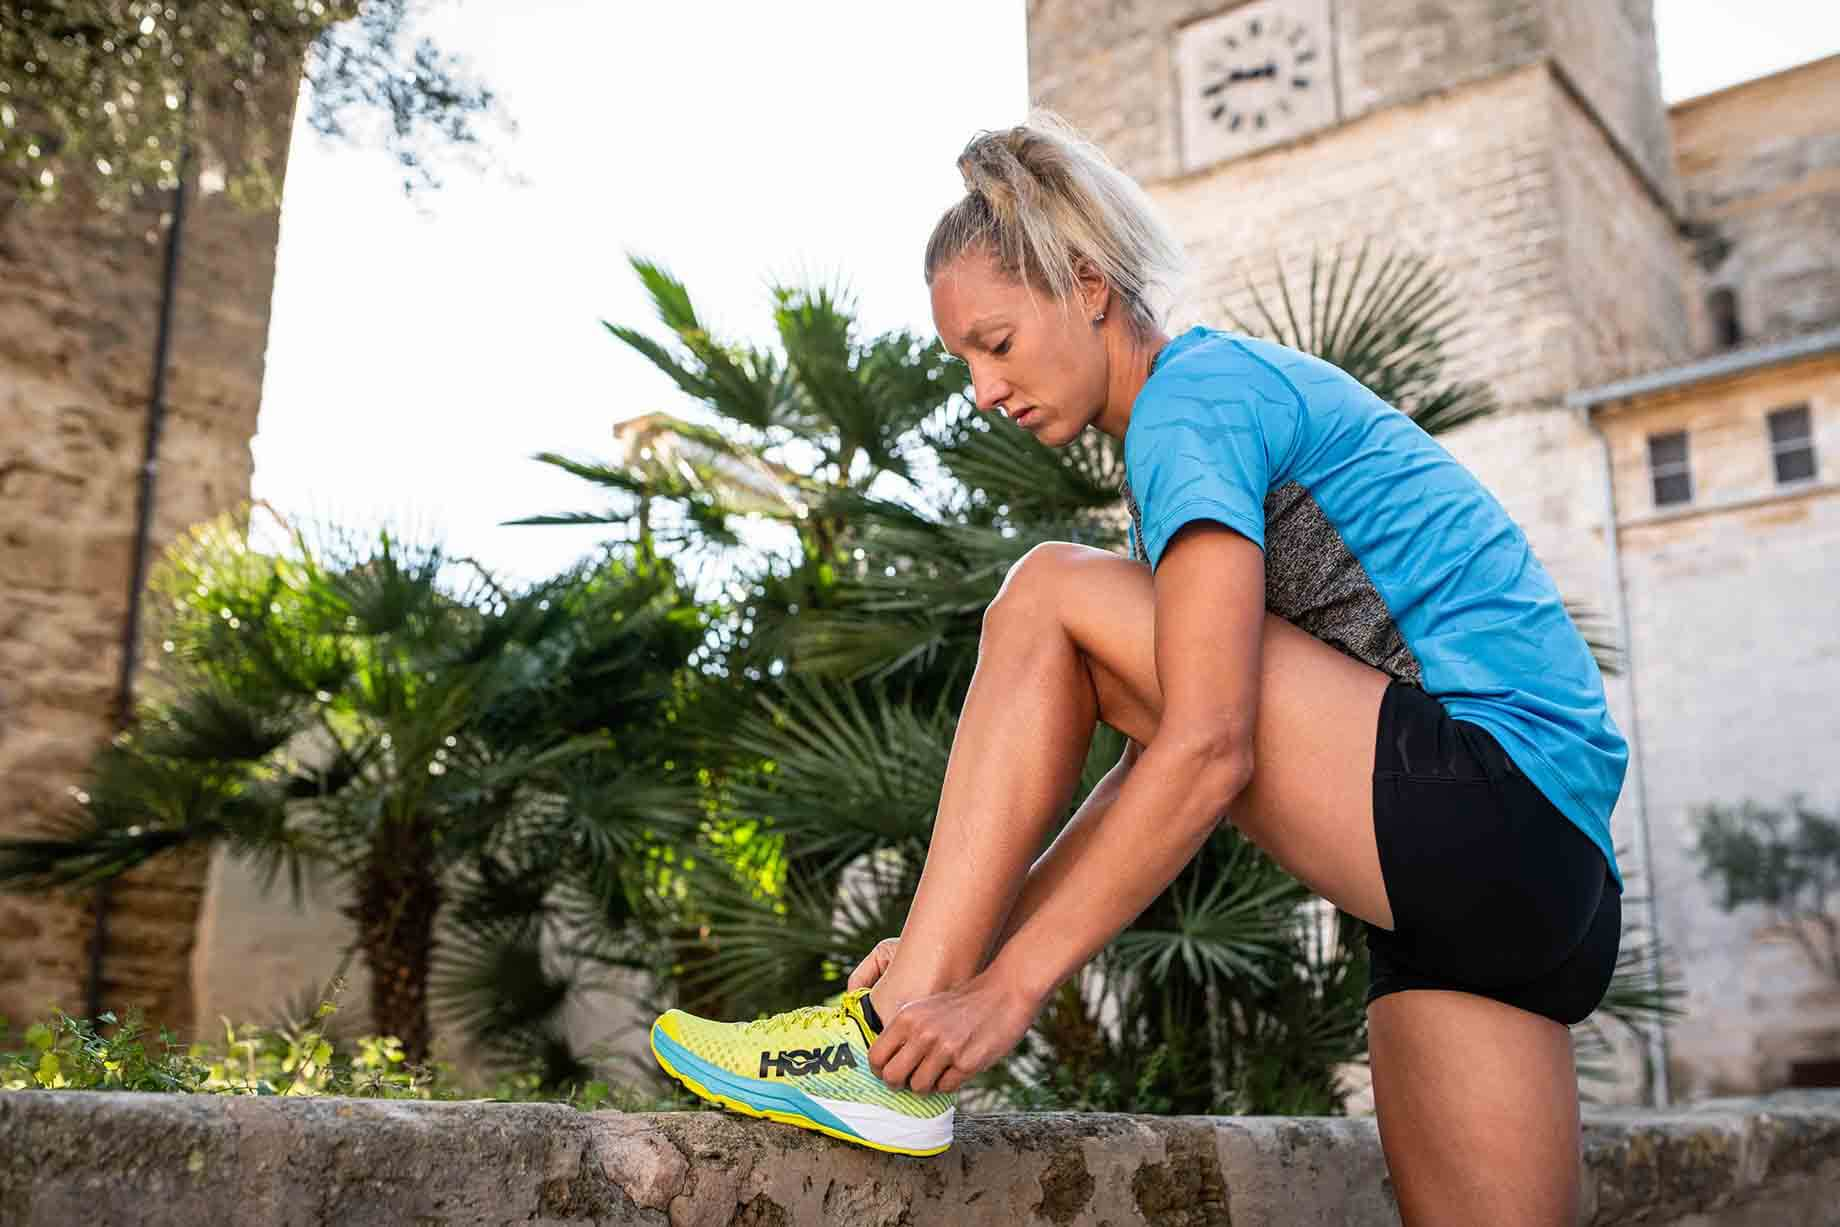 HOKA athlete Emma Pallant ties her shoelaces Carbon Rocket